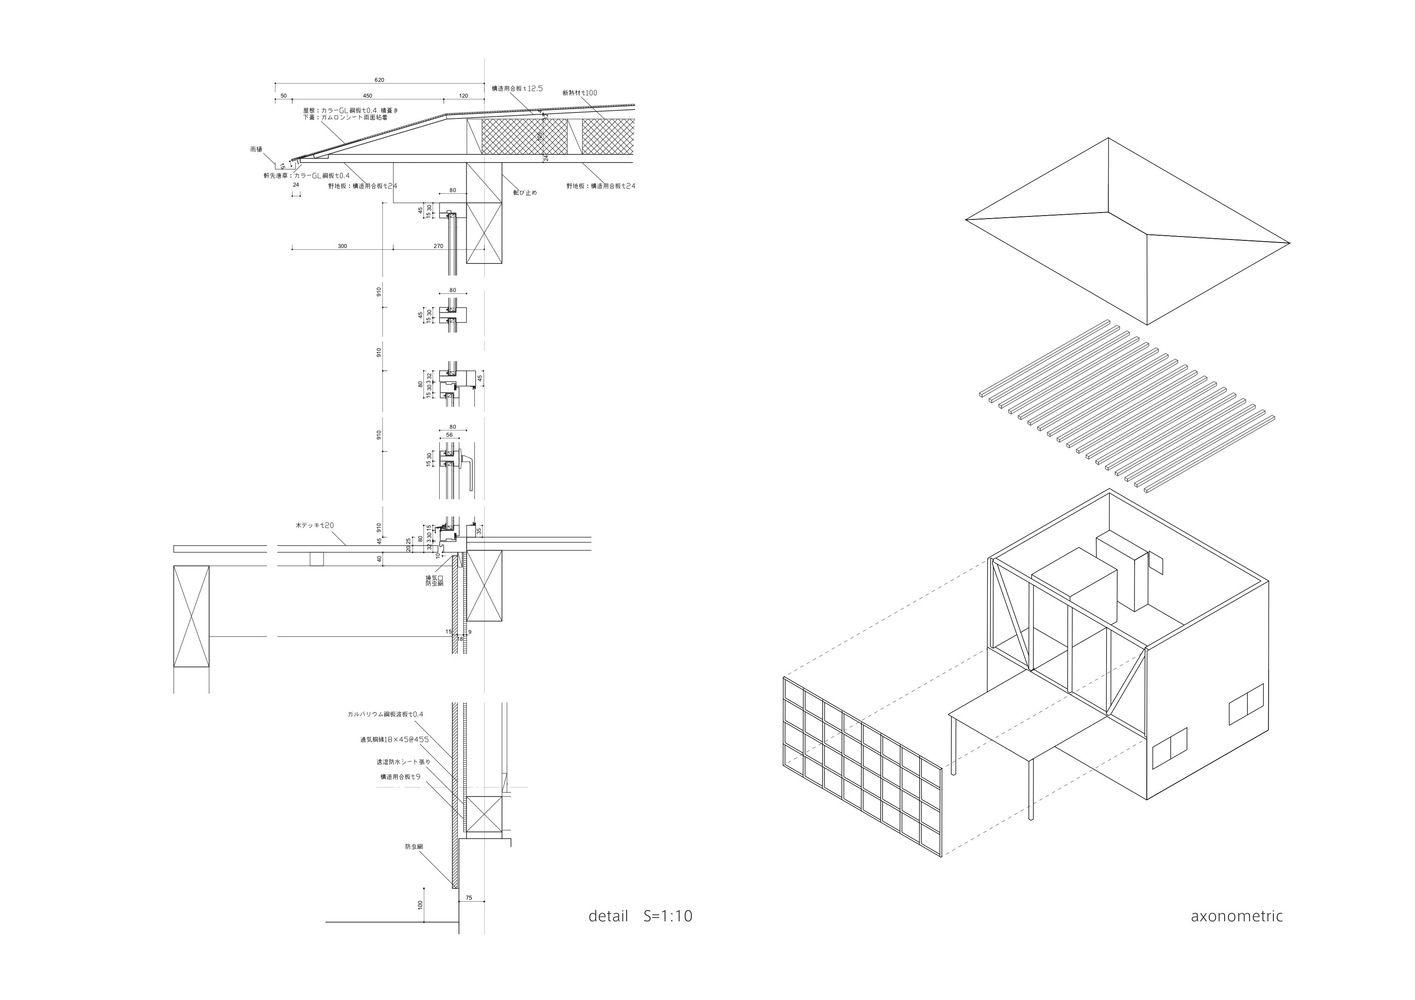 Module House gallery of module grid house / tetsuo yamaji architects - 22